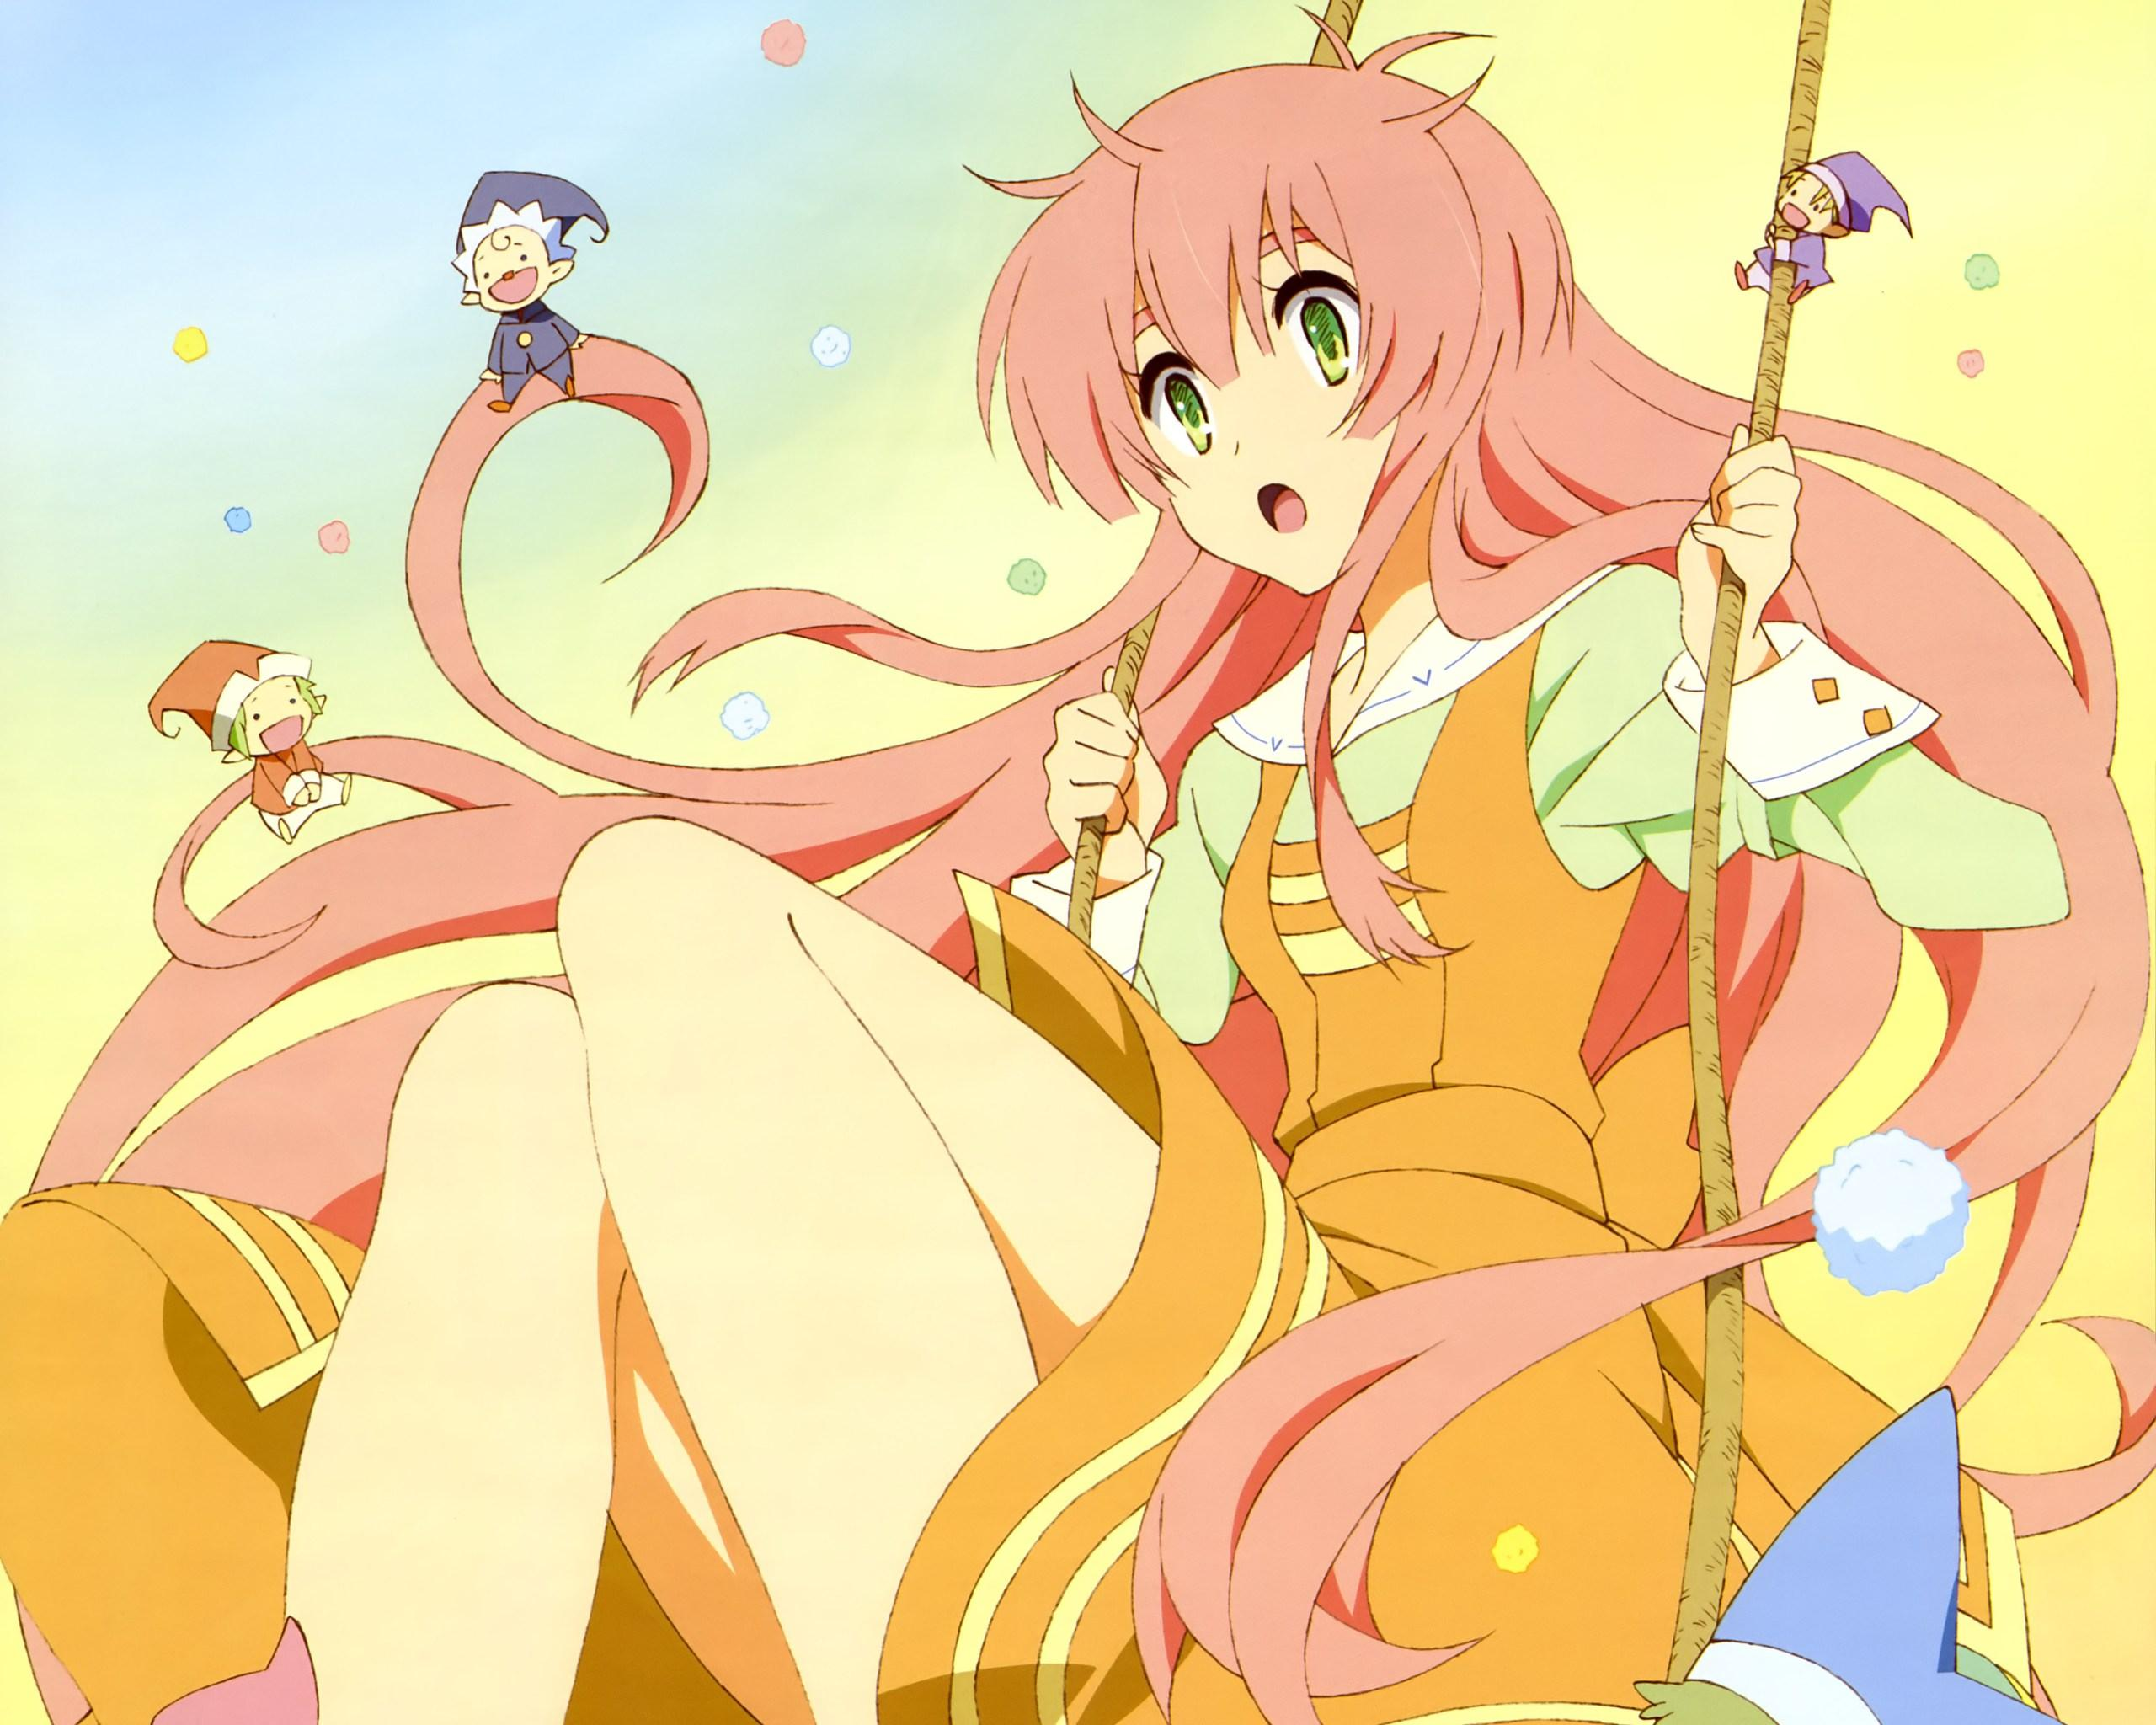 http://blog-imgs-45.fc2.com/a/n/k/ankosokuho/Jinrui_Wa_suitai_Shimashita_03_convert_20120716213932.jpg